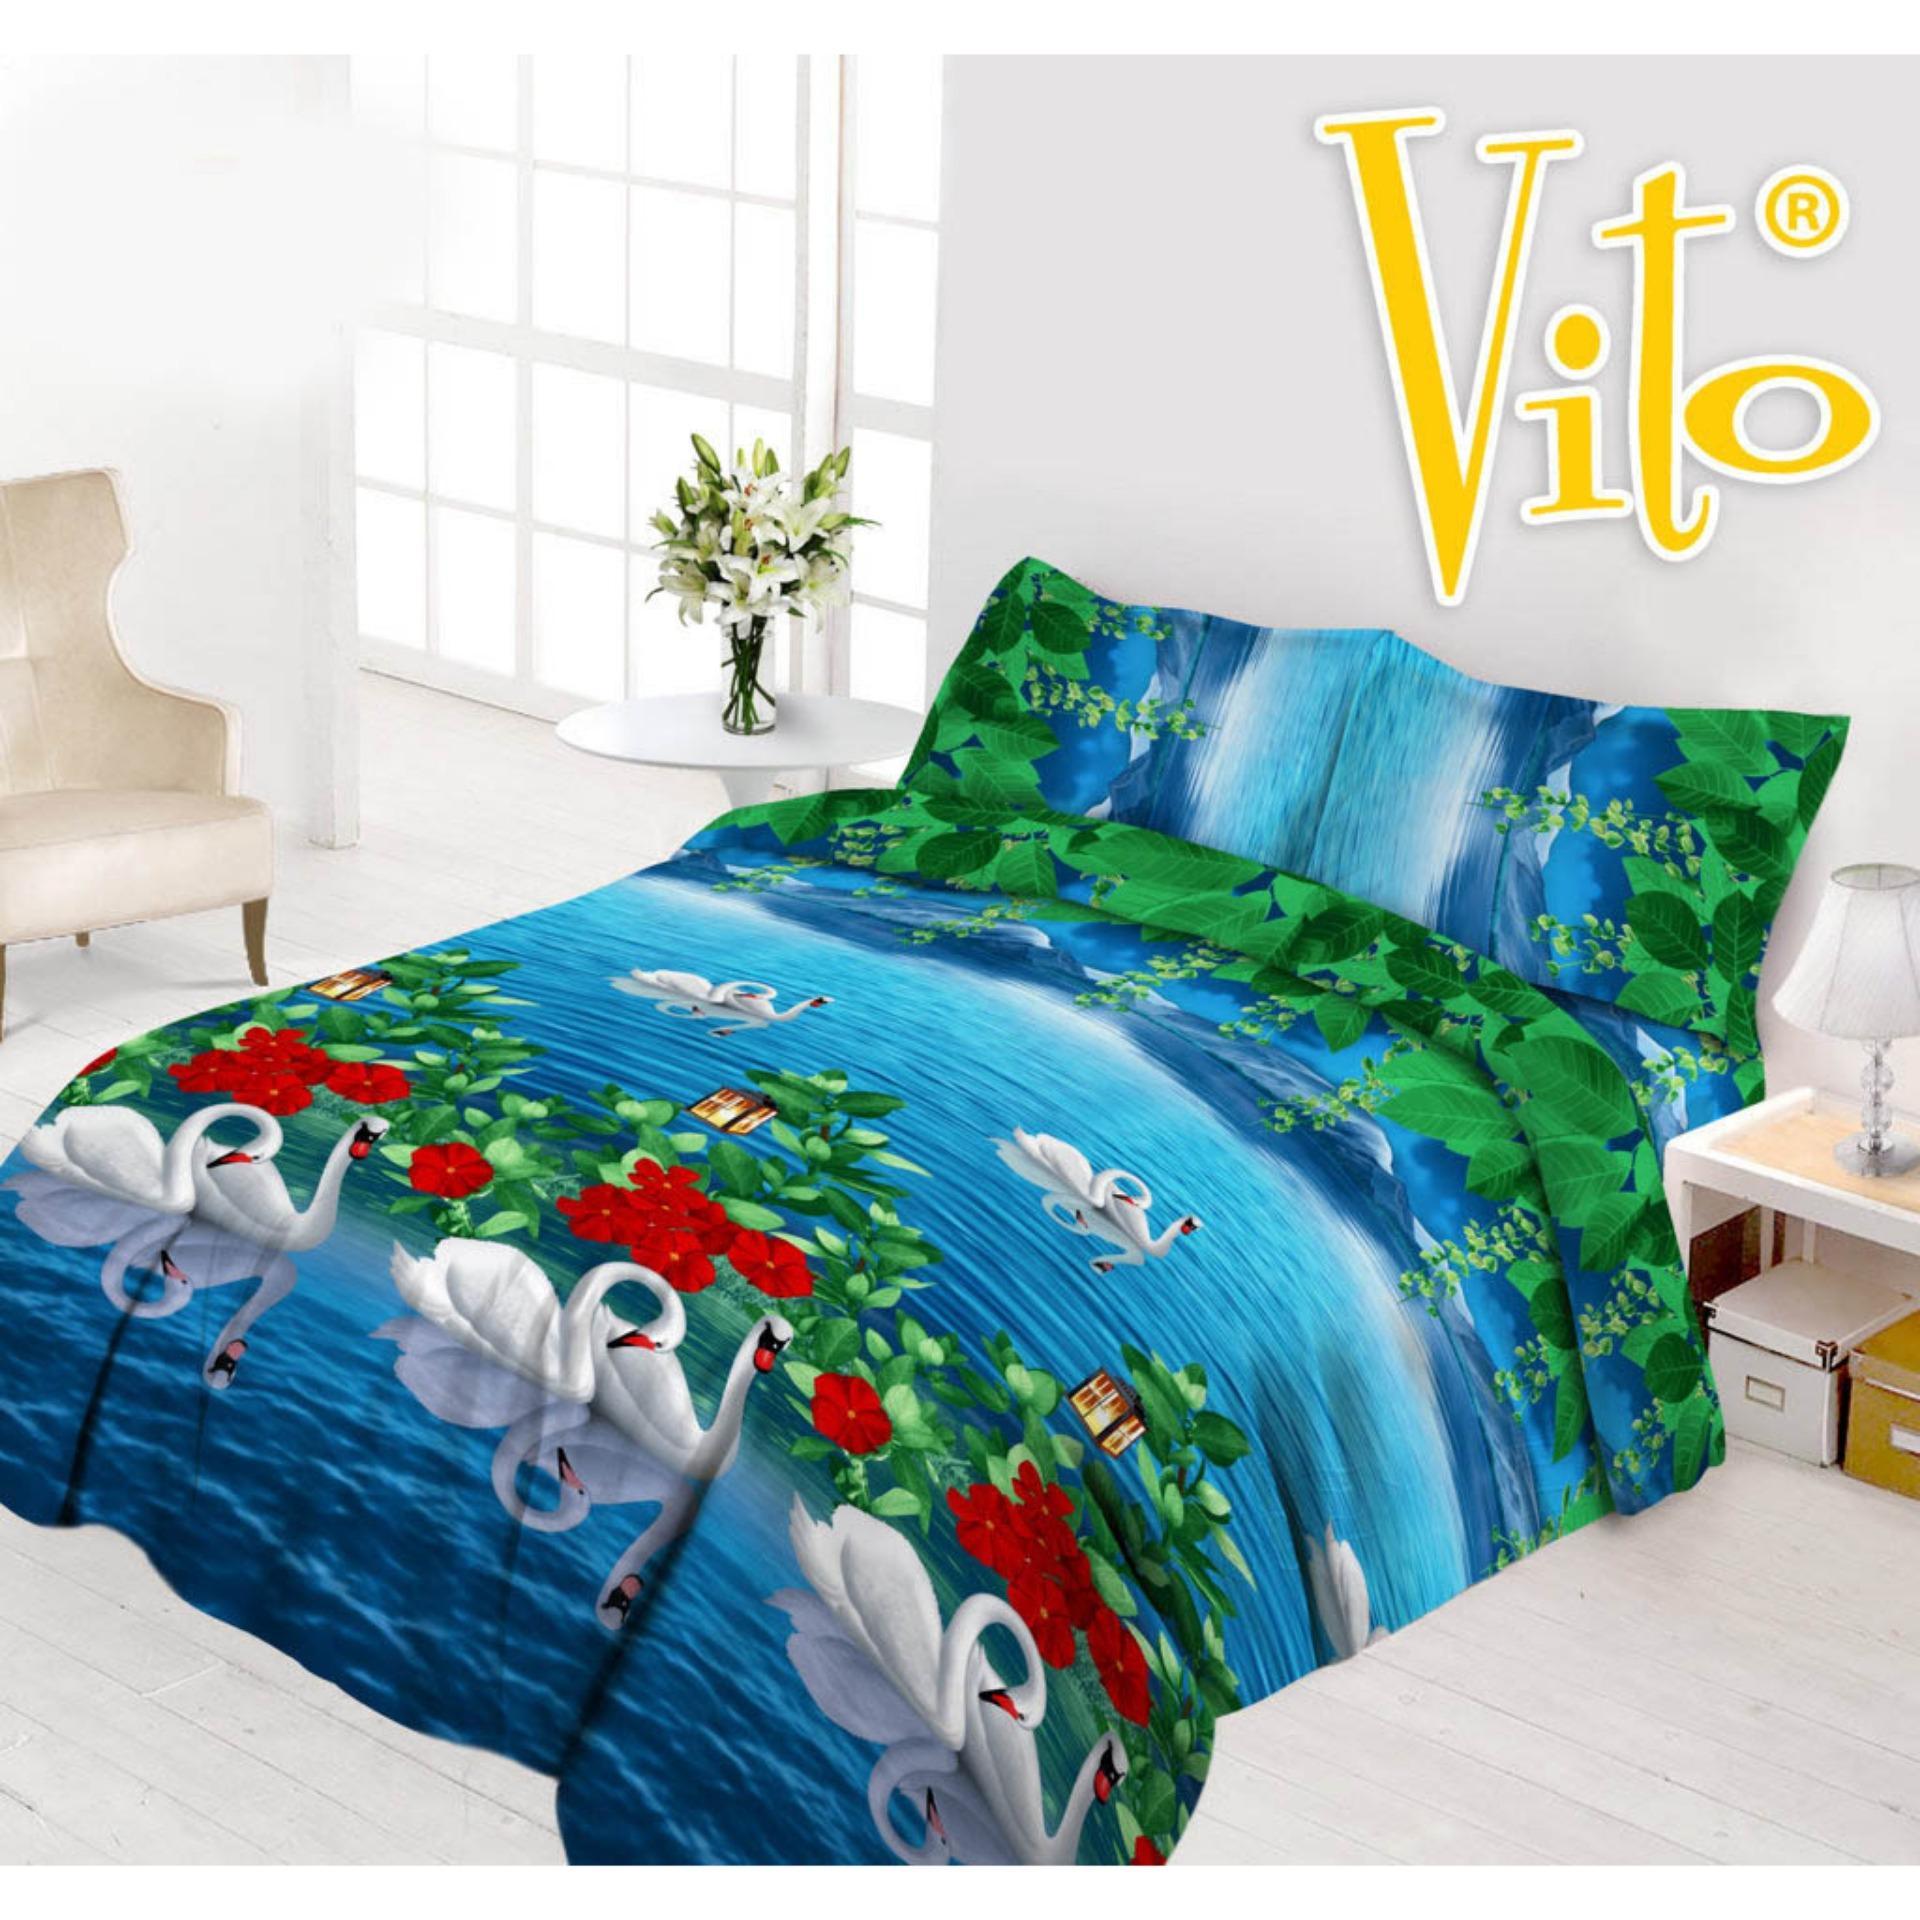 Furniture Vito Daftar Harga November 2018 Selimut Kids Sutra Panel 100x140 Keroppi Sprei Disperse Series Uk 180 B4 Swans